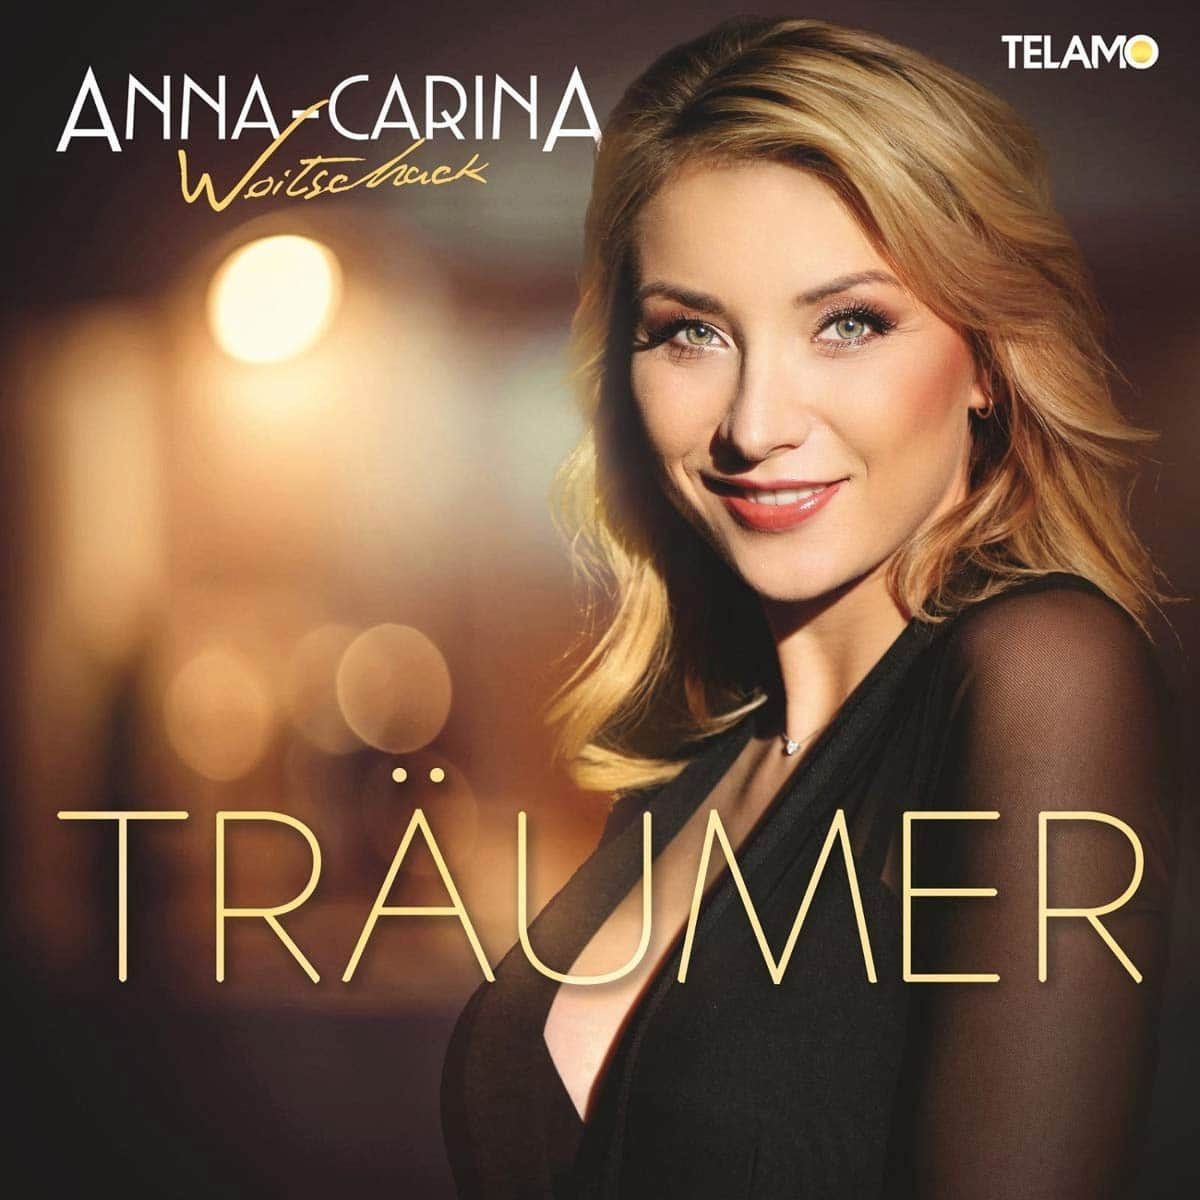 "Anna-Carina Woitschack CD ""Träumer"" 2021 - CD-Cover"